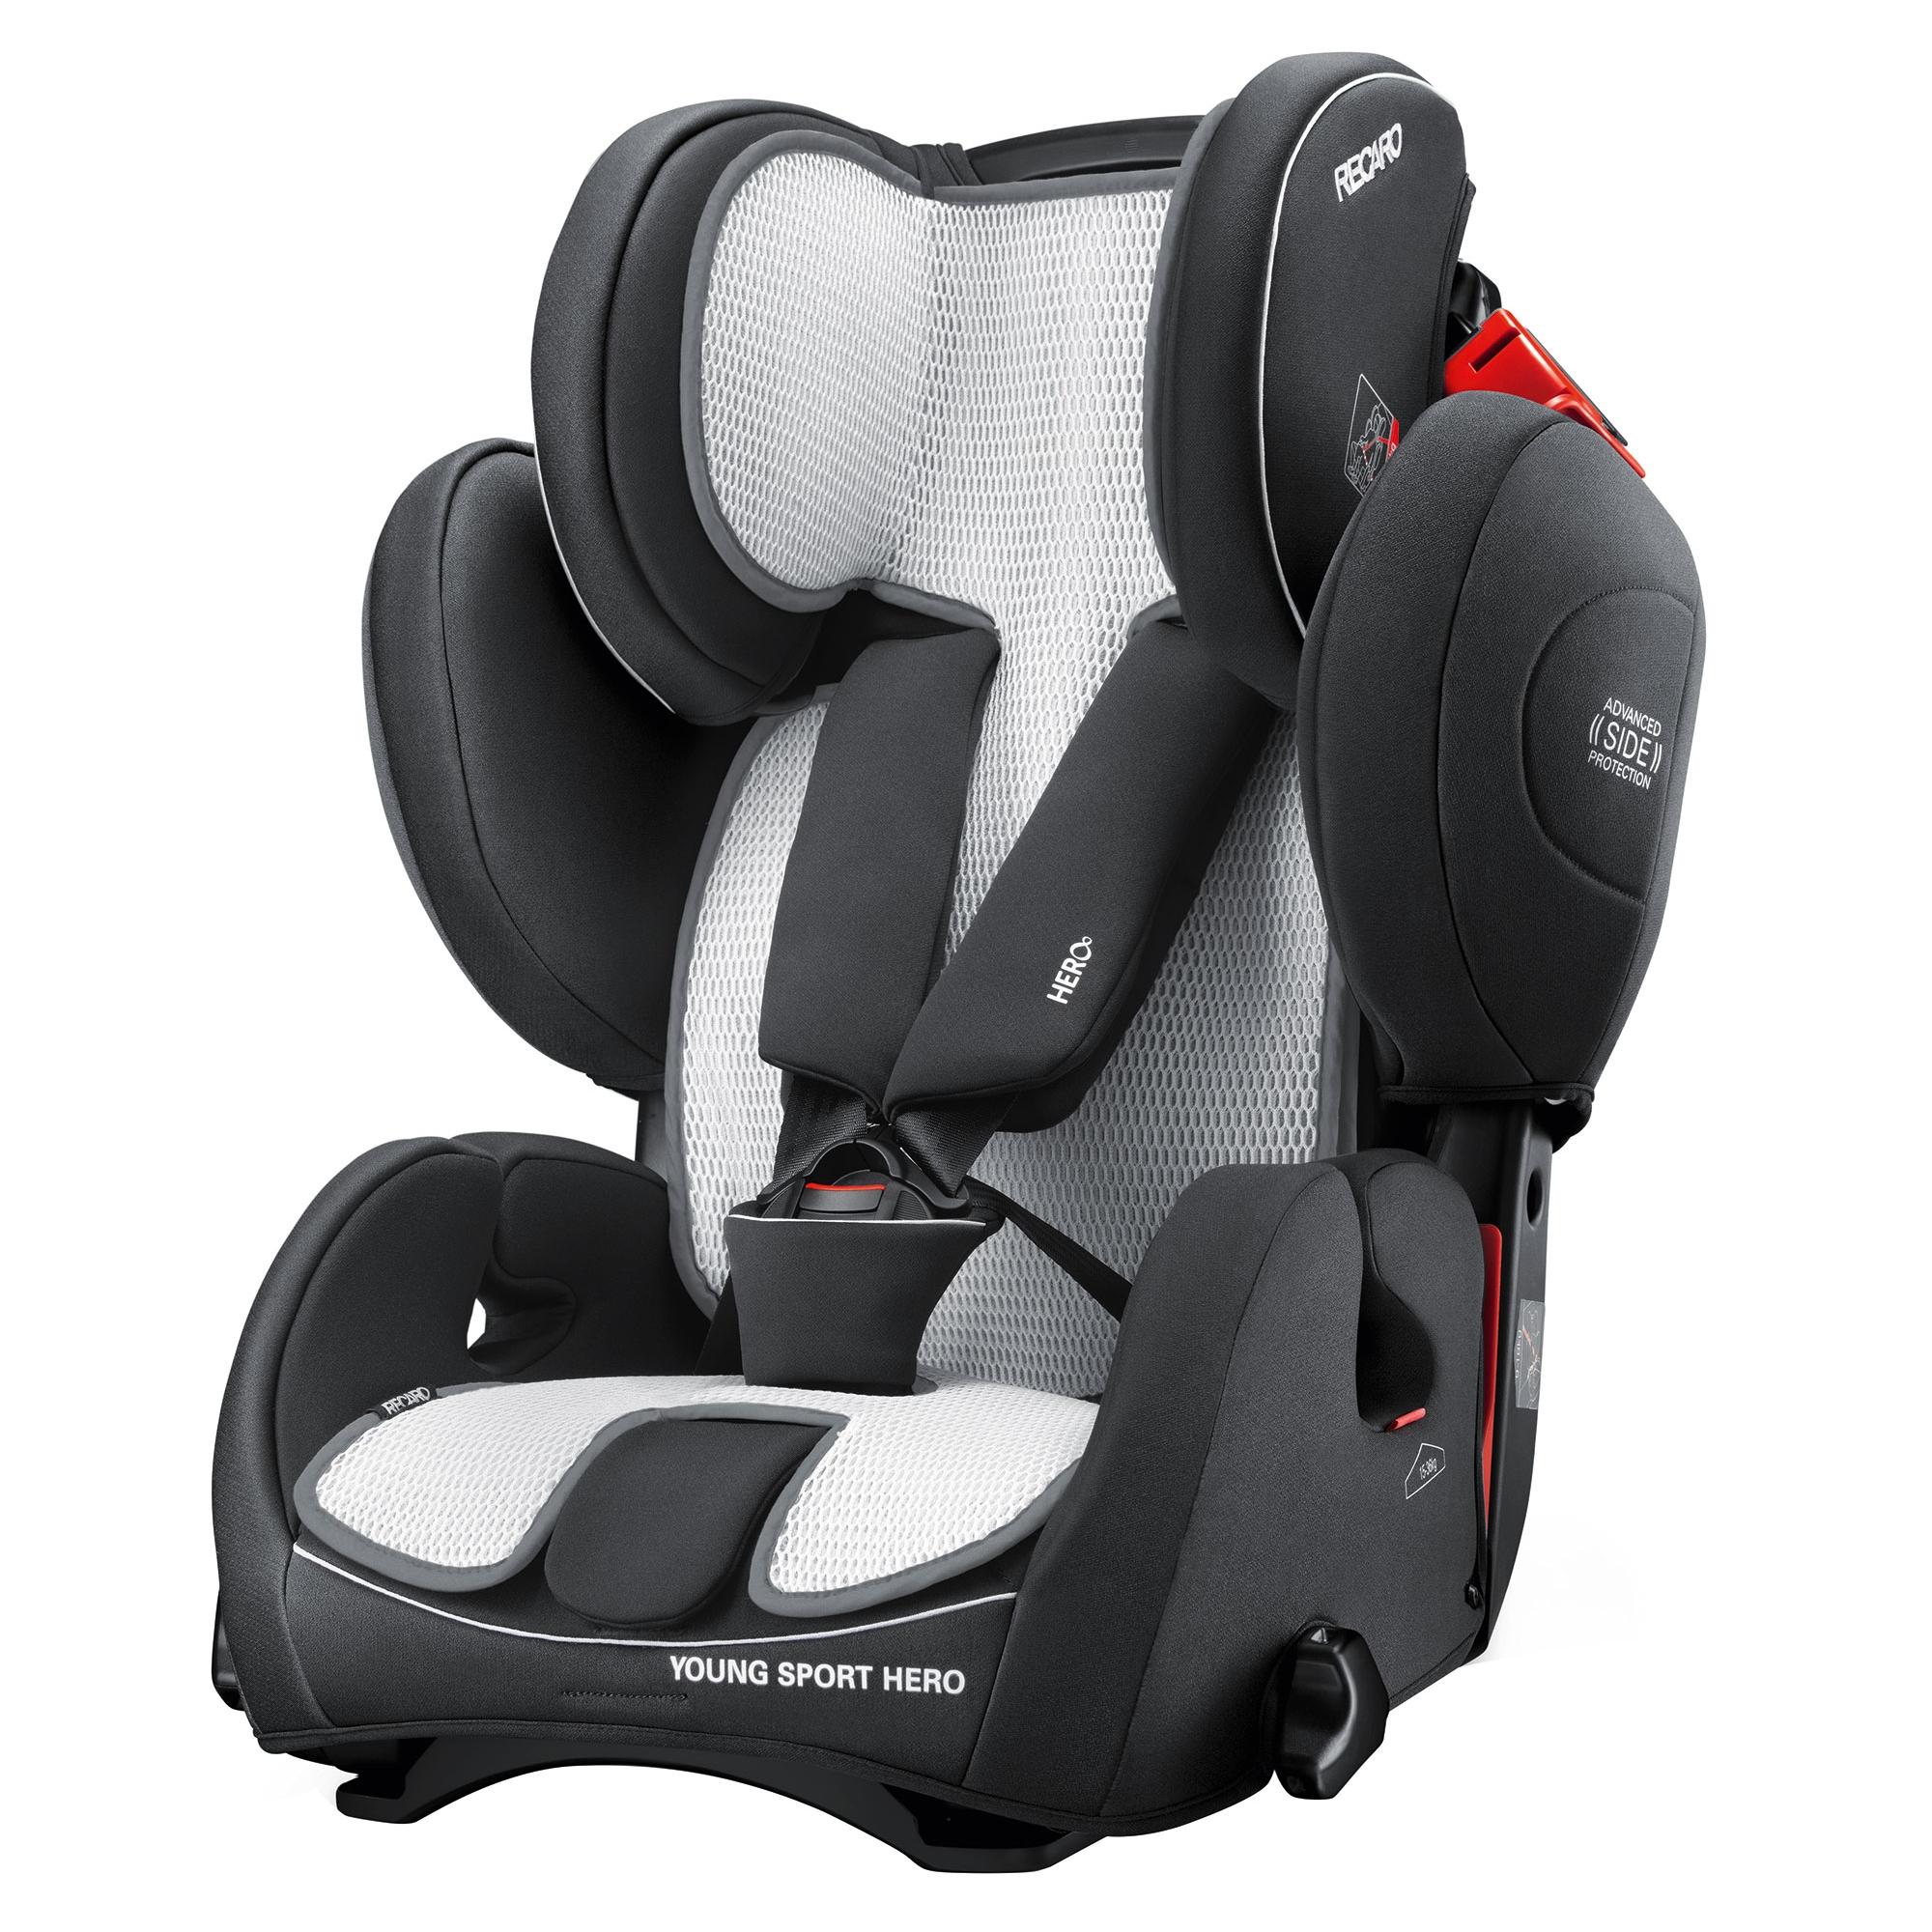 Recaro Young Sport Hero Air Mesh Summer Cover For Child Car Seats Ebay